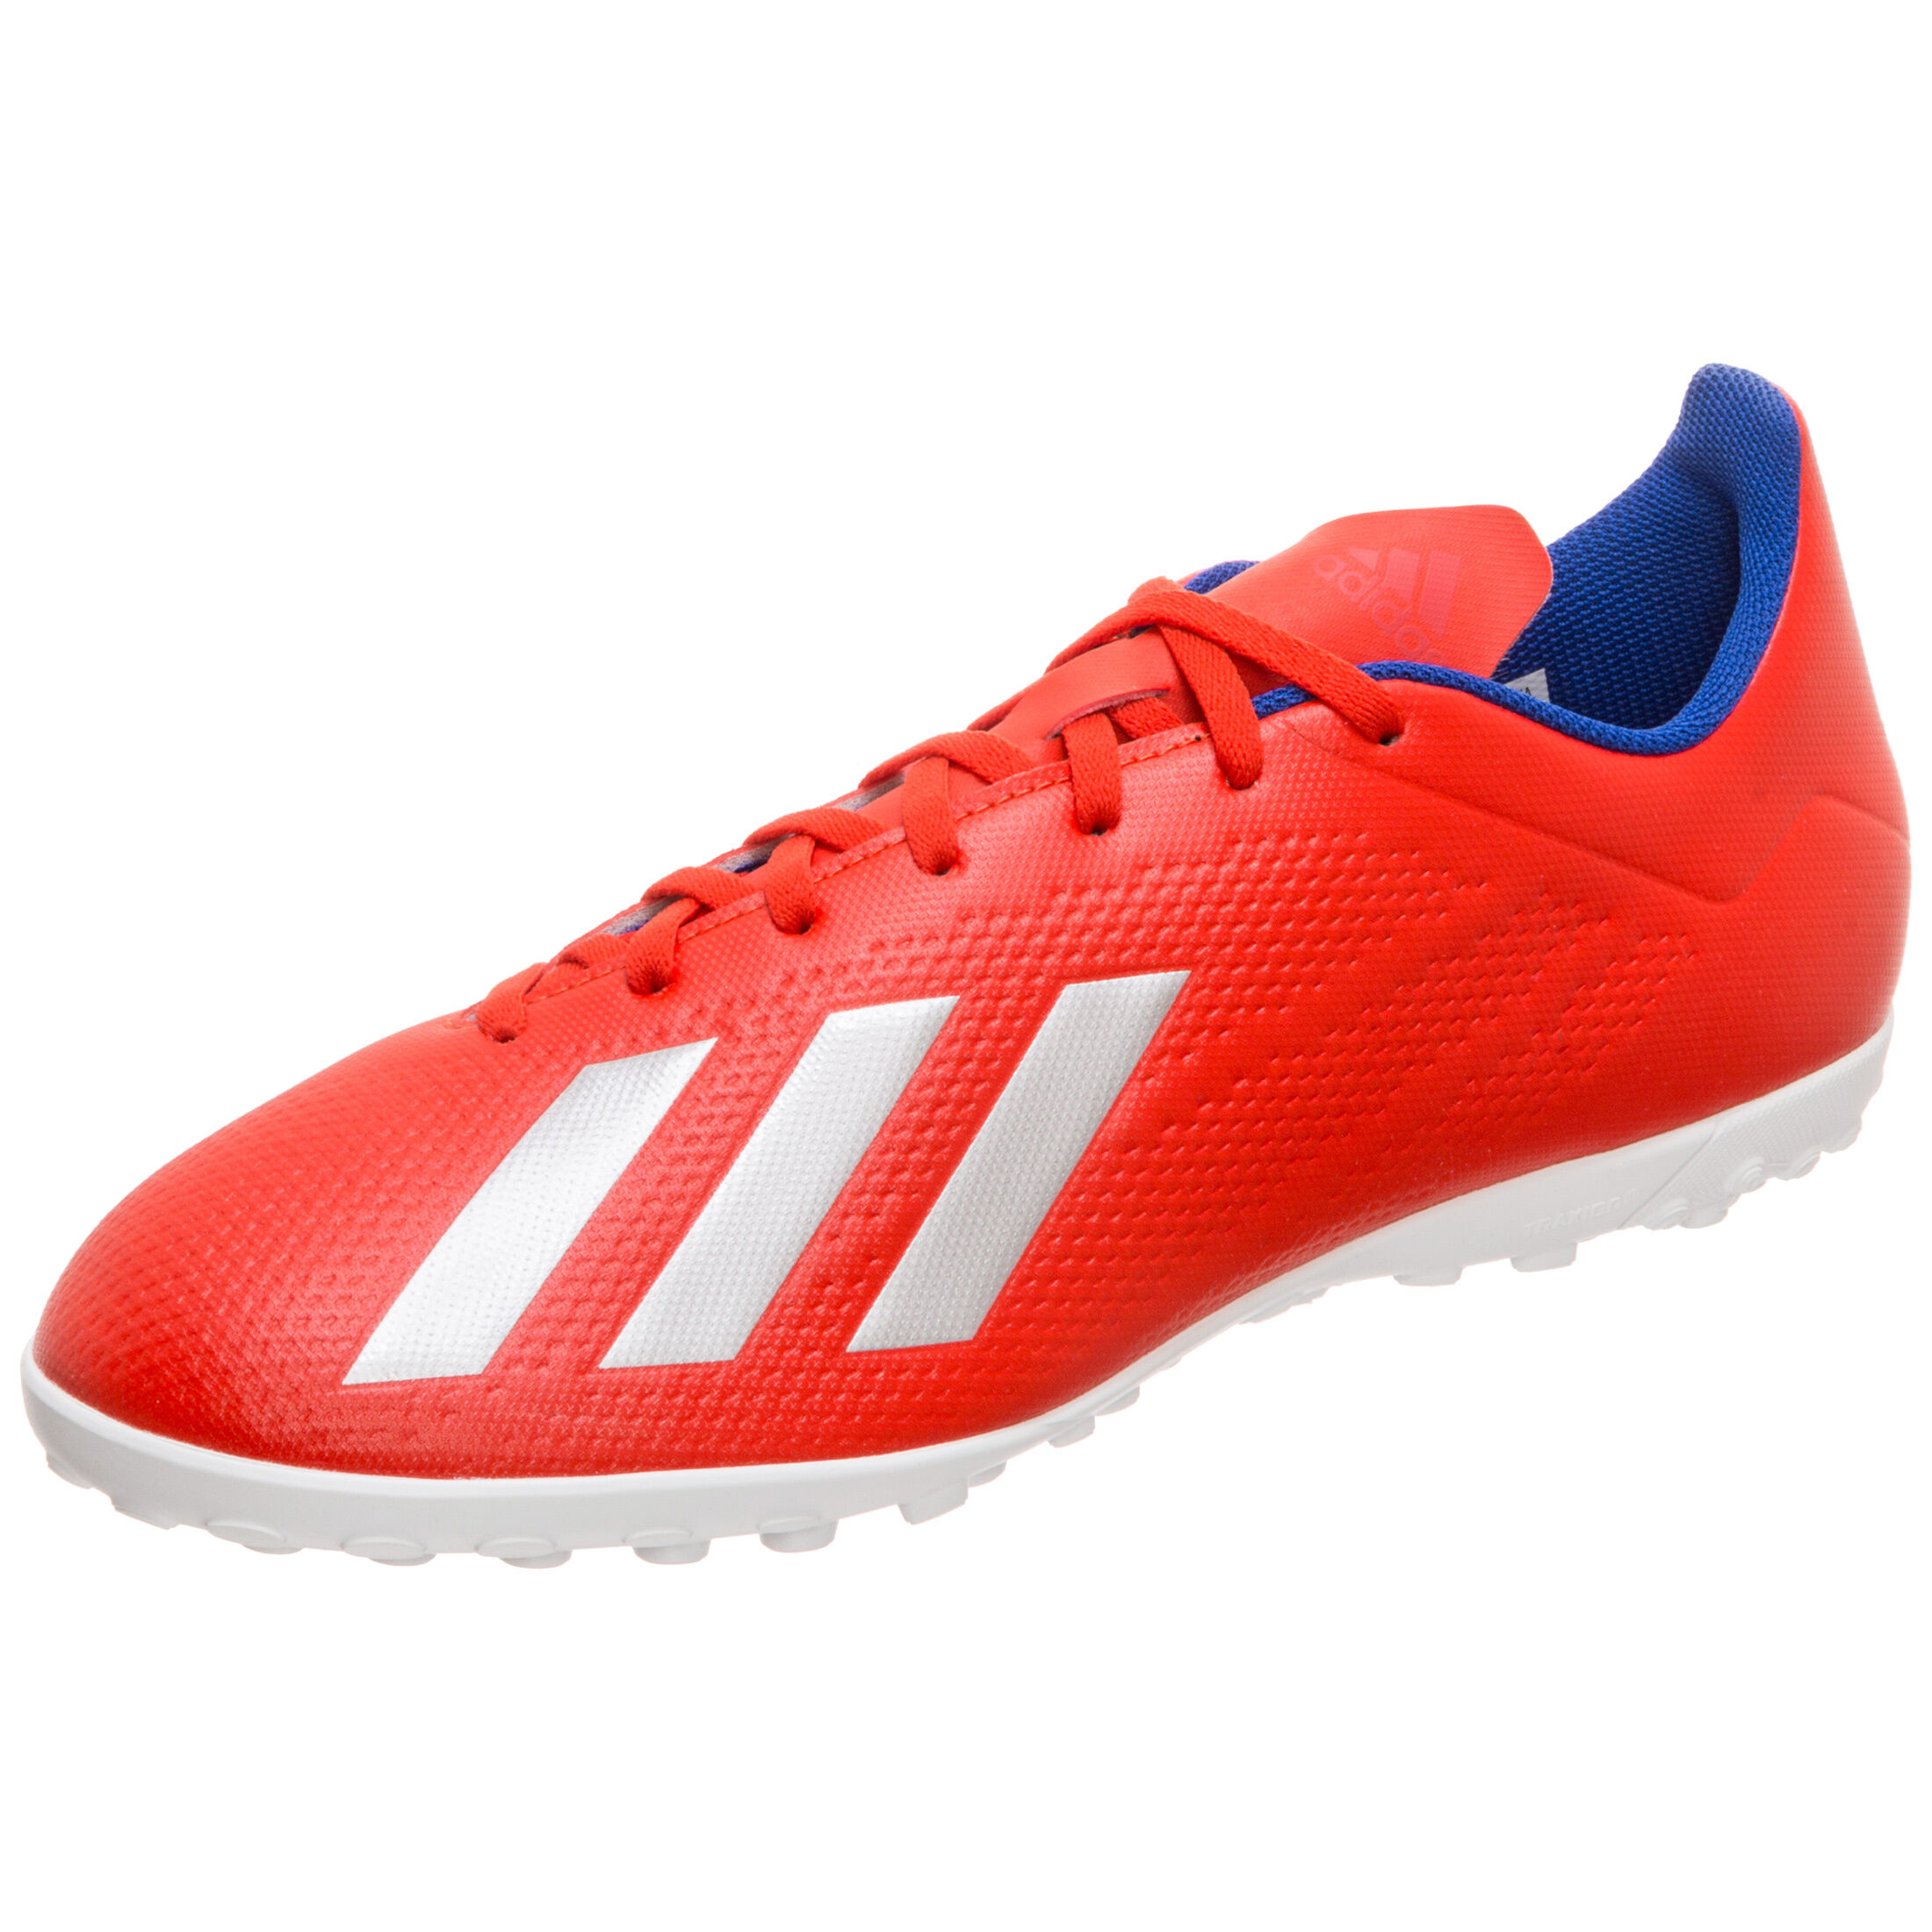 Sale 1 Tf 16 X Tango Billig Uk Orange Adidas c1J3lFKT